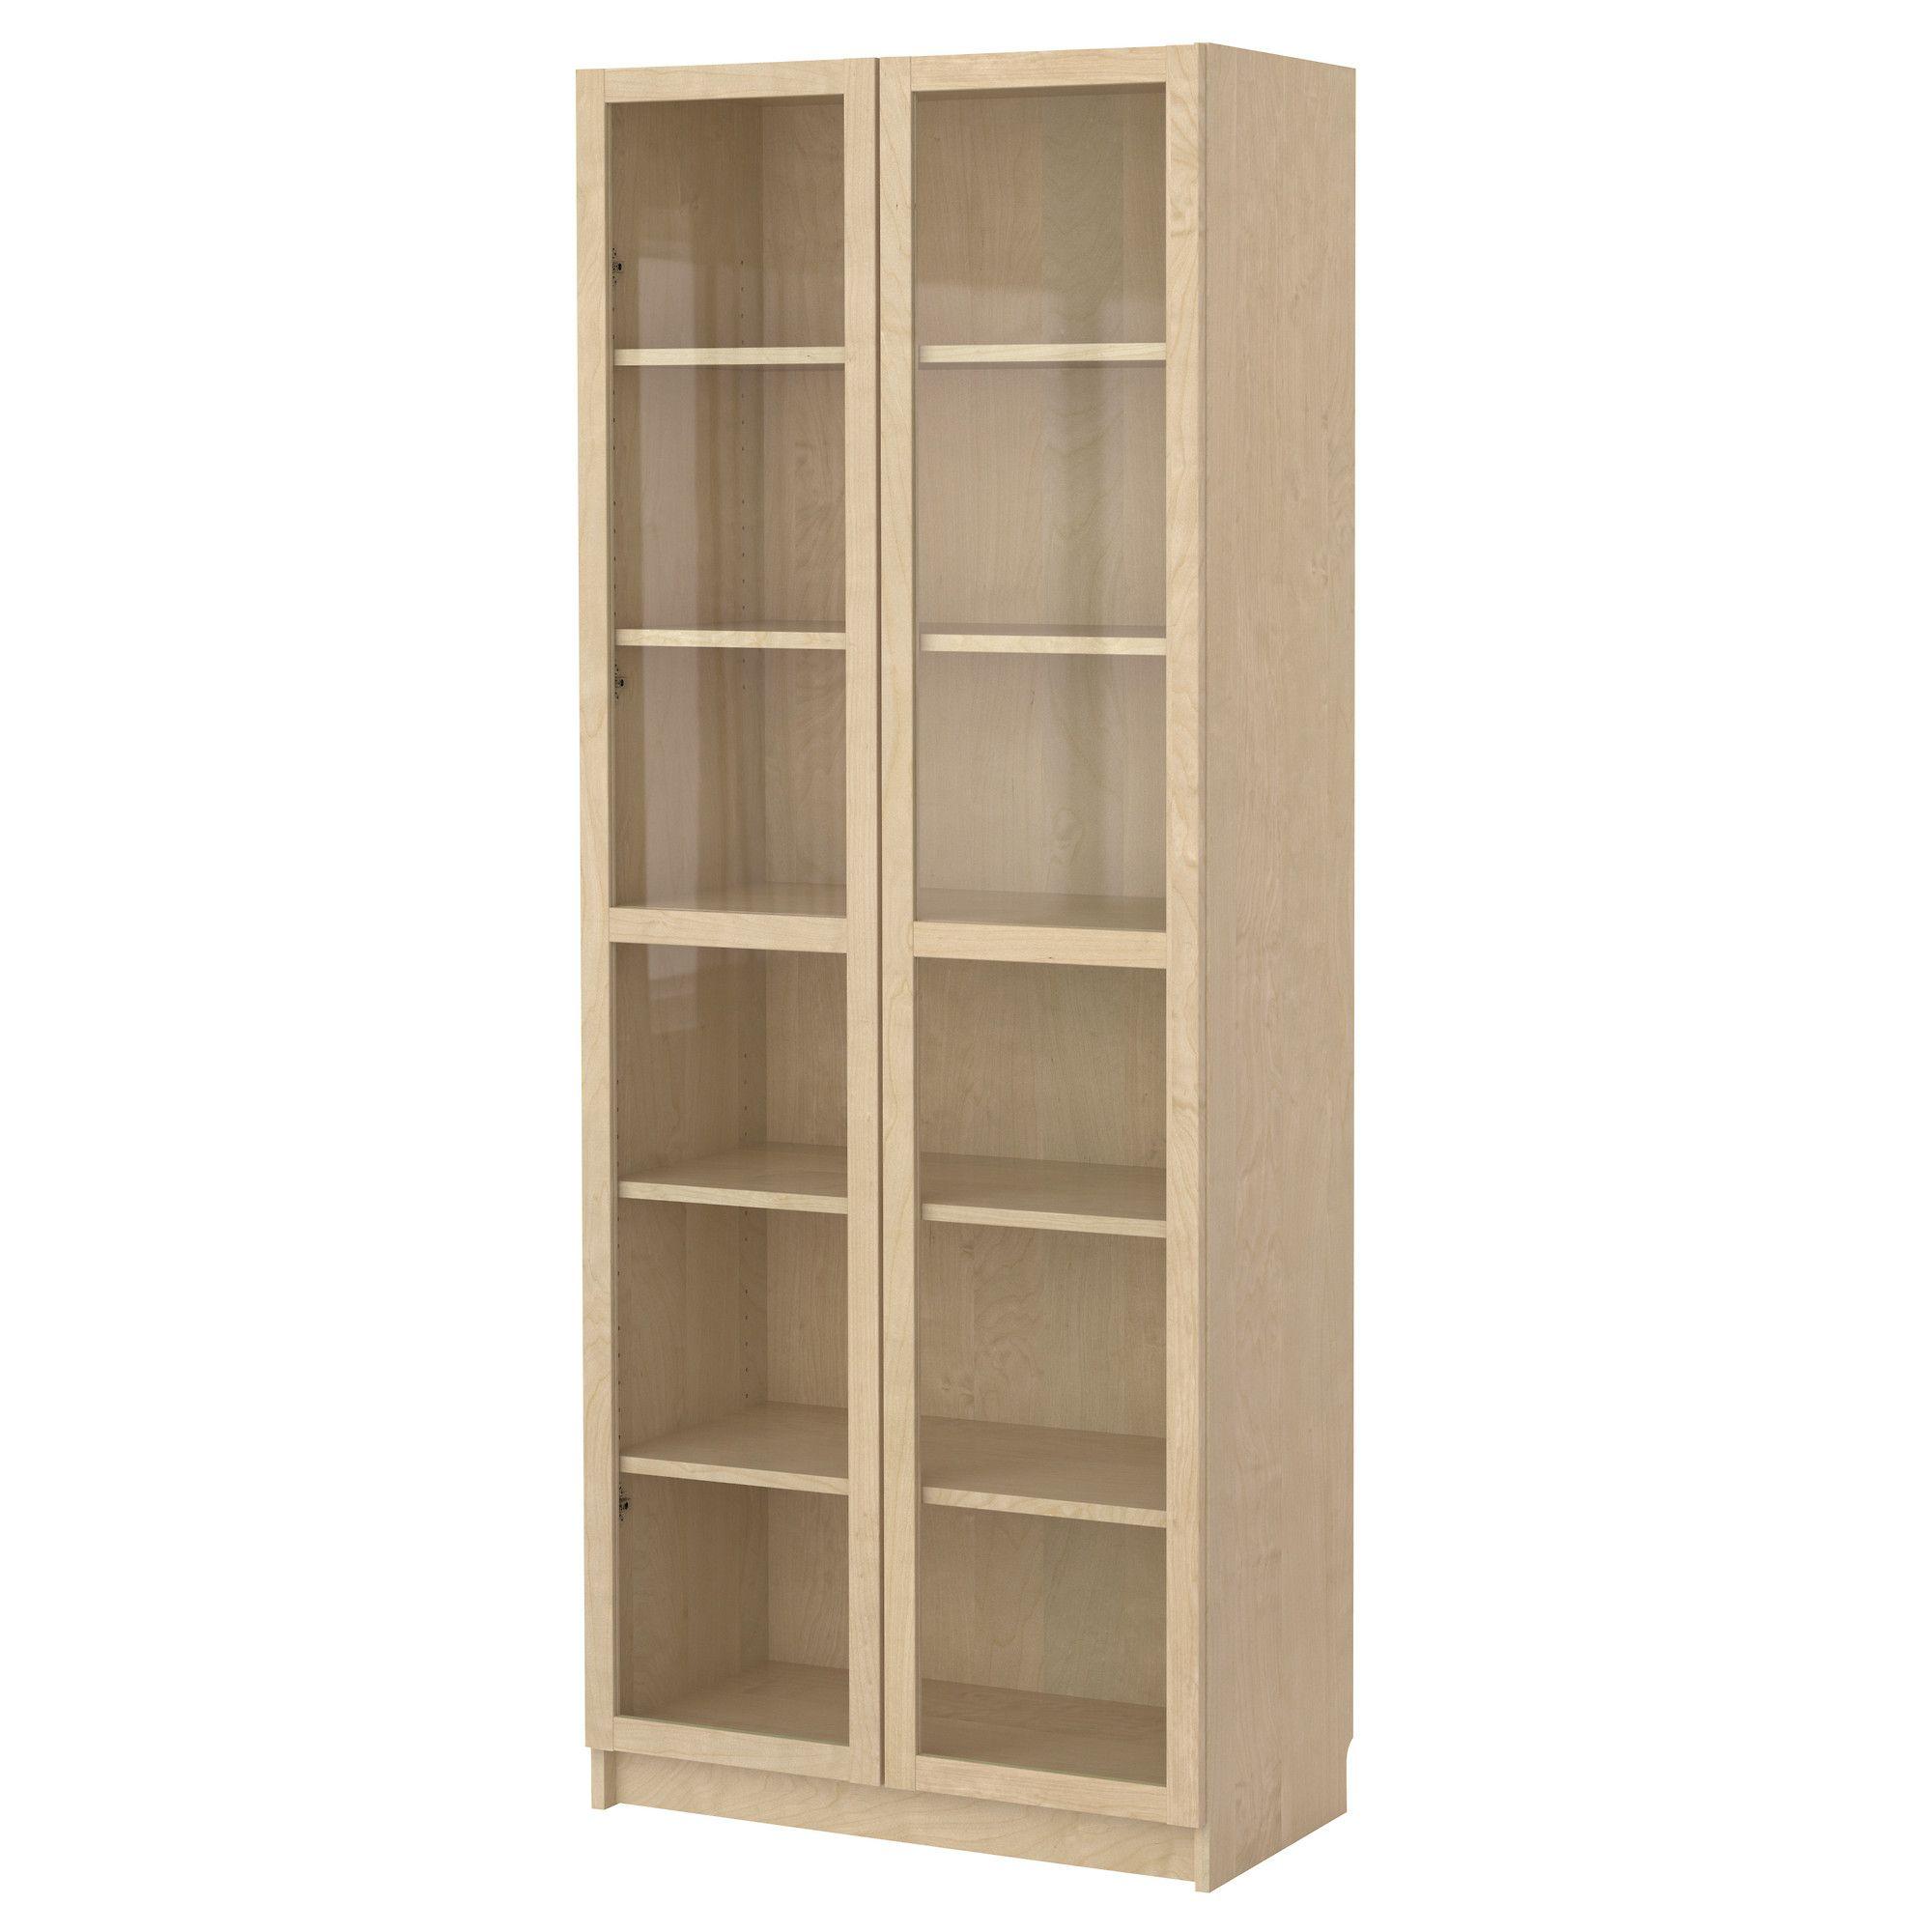 finishes bookshelf shelf bookcases c on kp wheels wide orion standard multiple bookcase